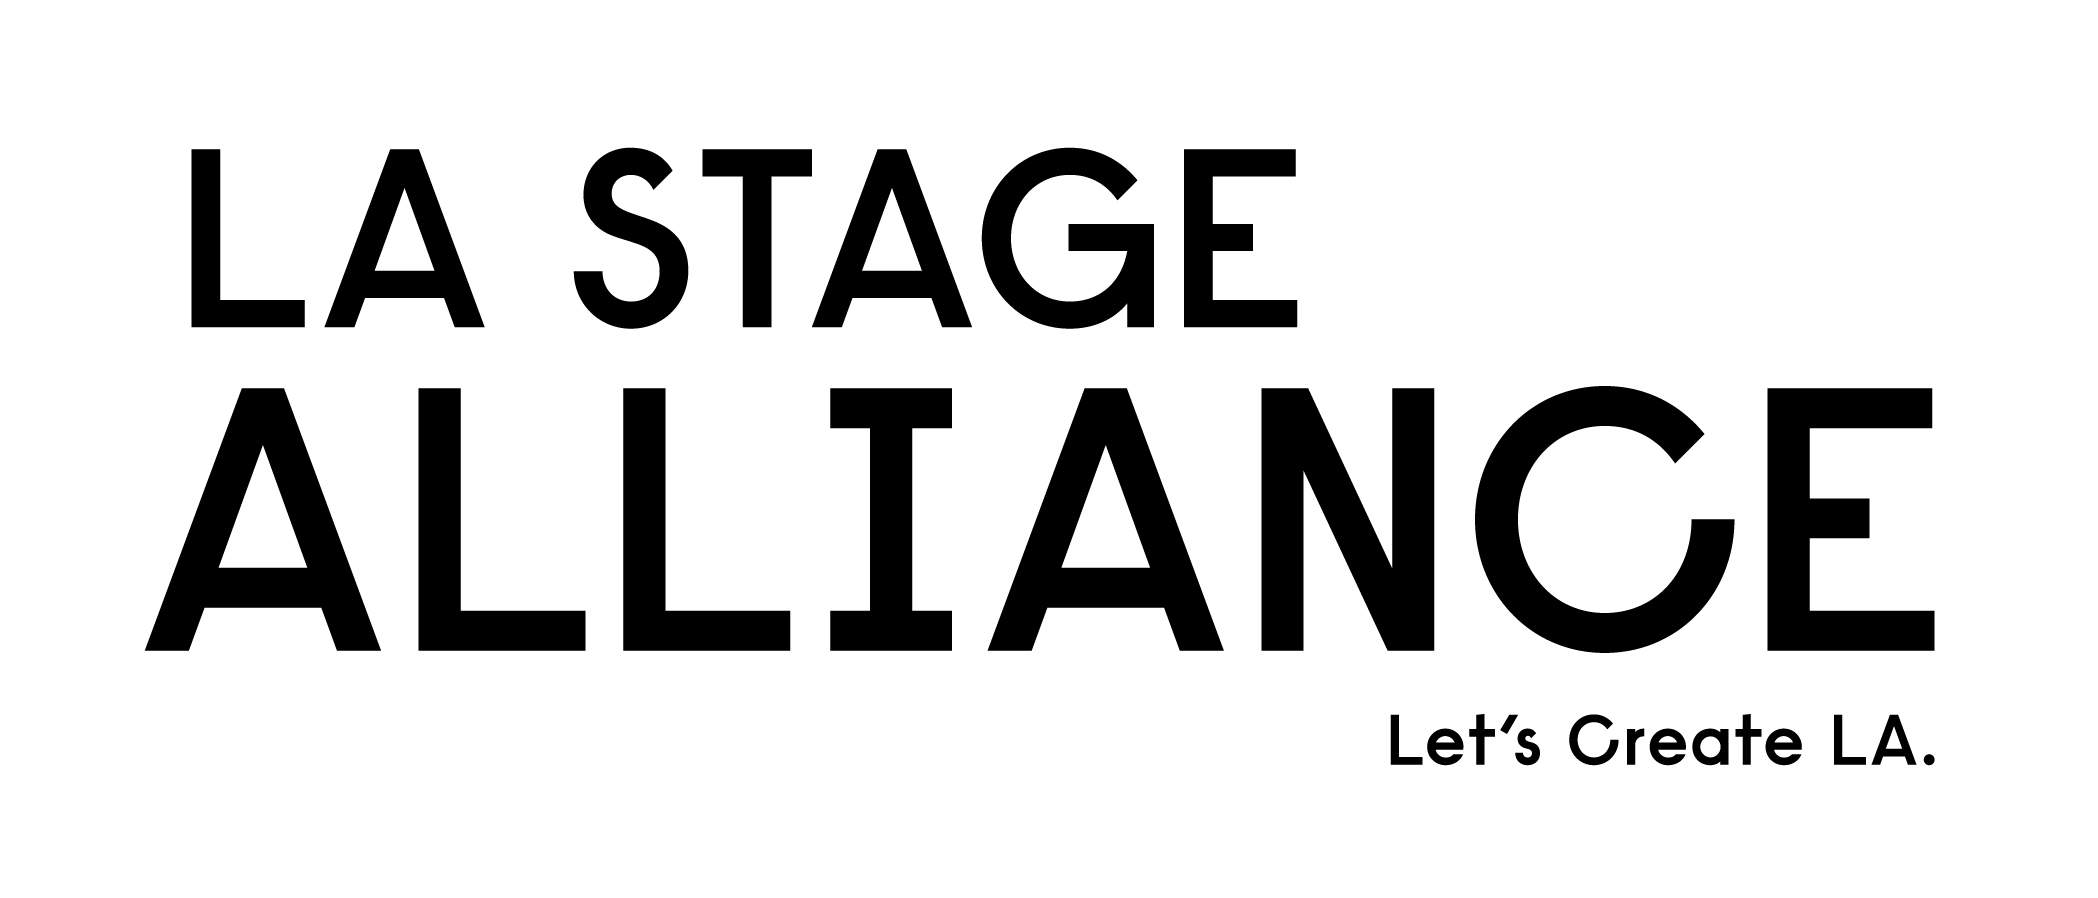 logo_tagline_black.jpg